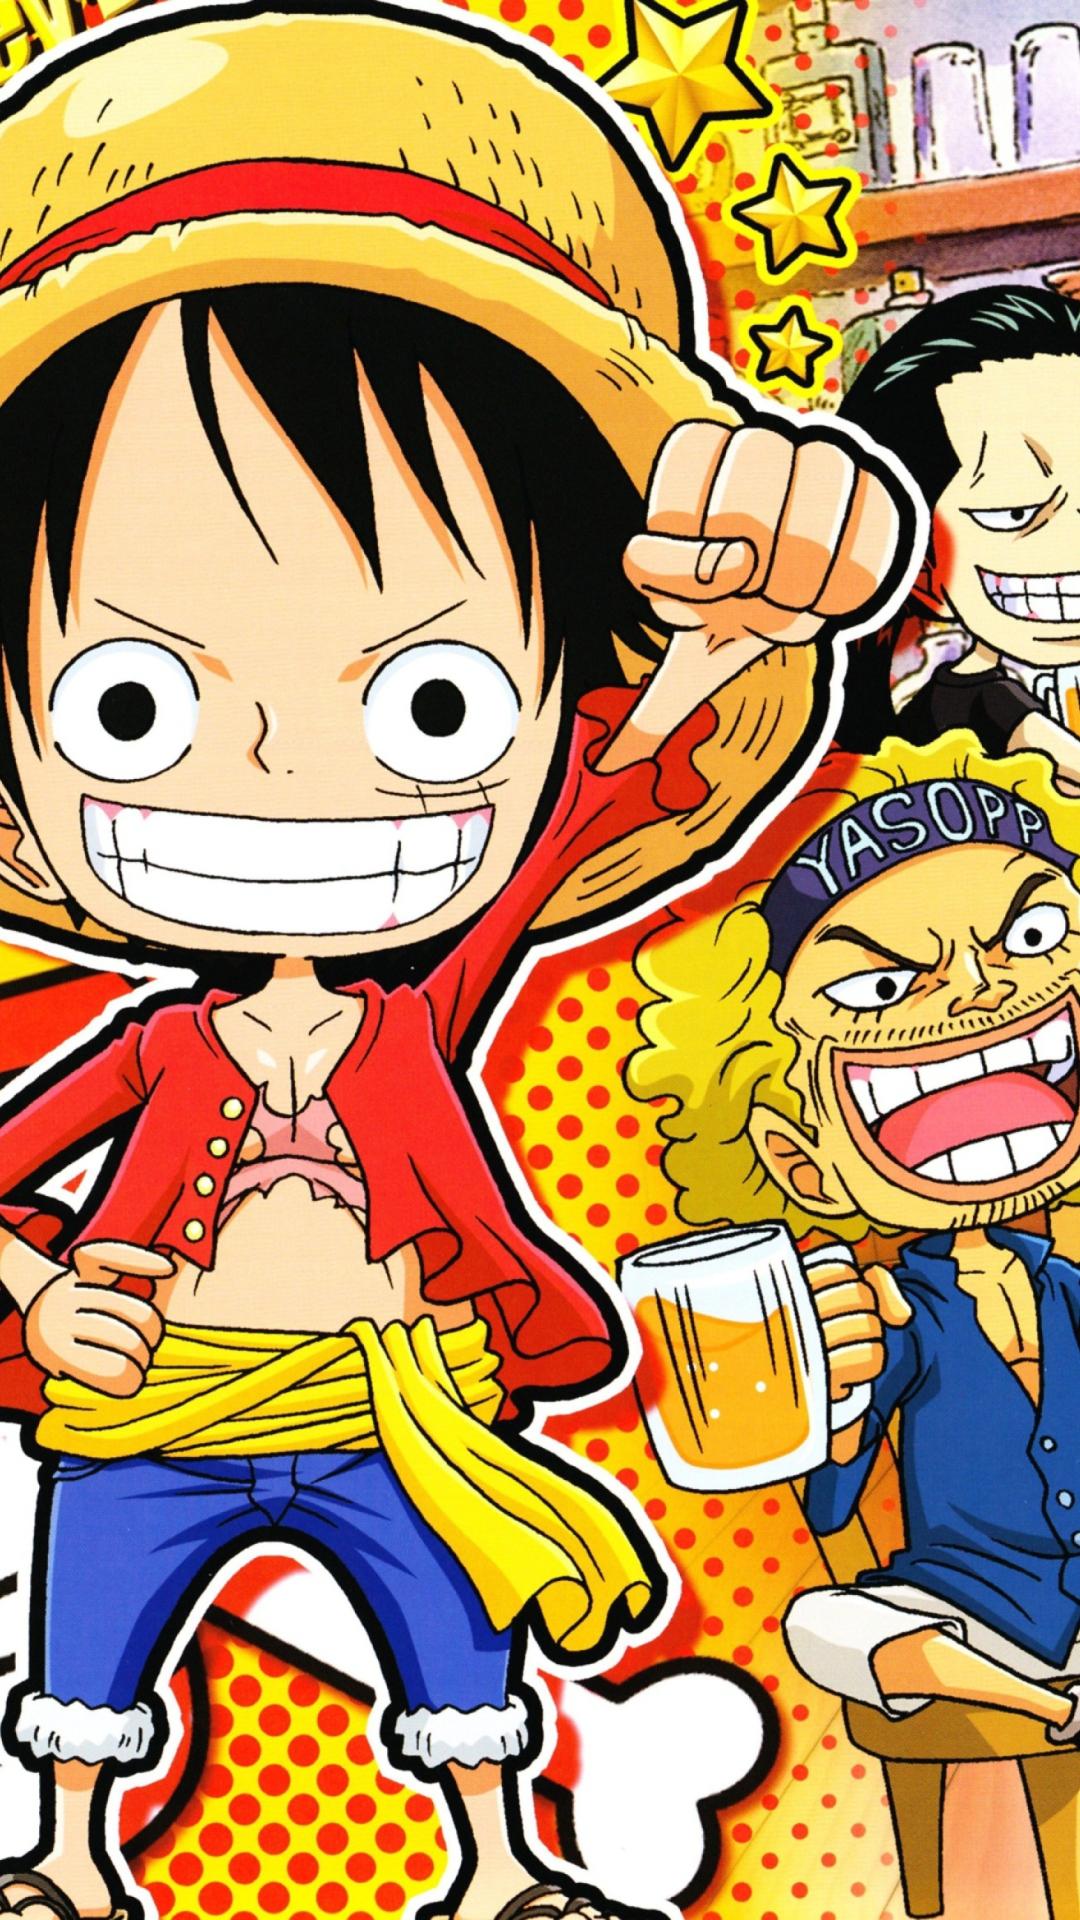 Bleach Wallpaper Hd One Piece Iphone Backgrounds Free Download Pixelstalk Net